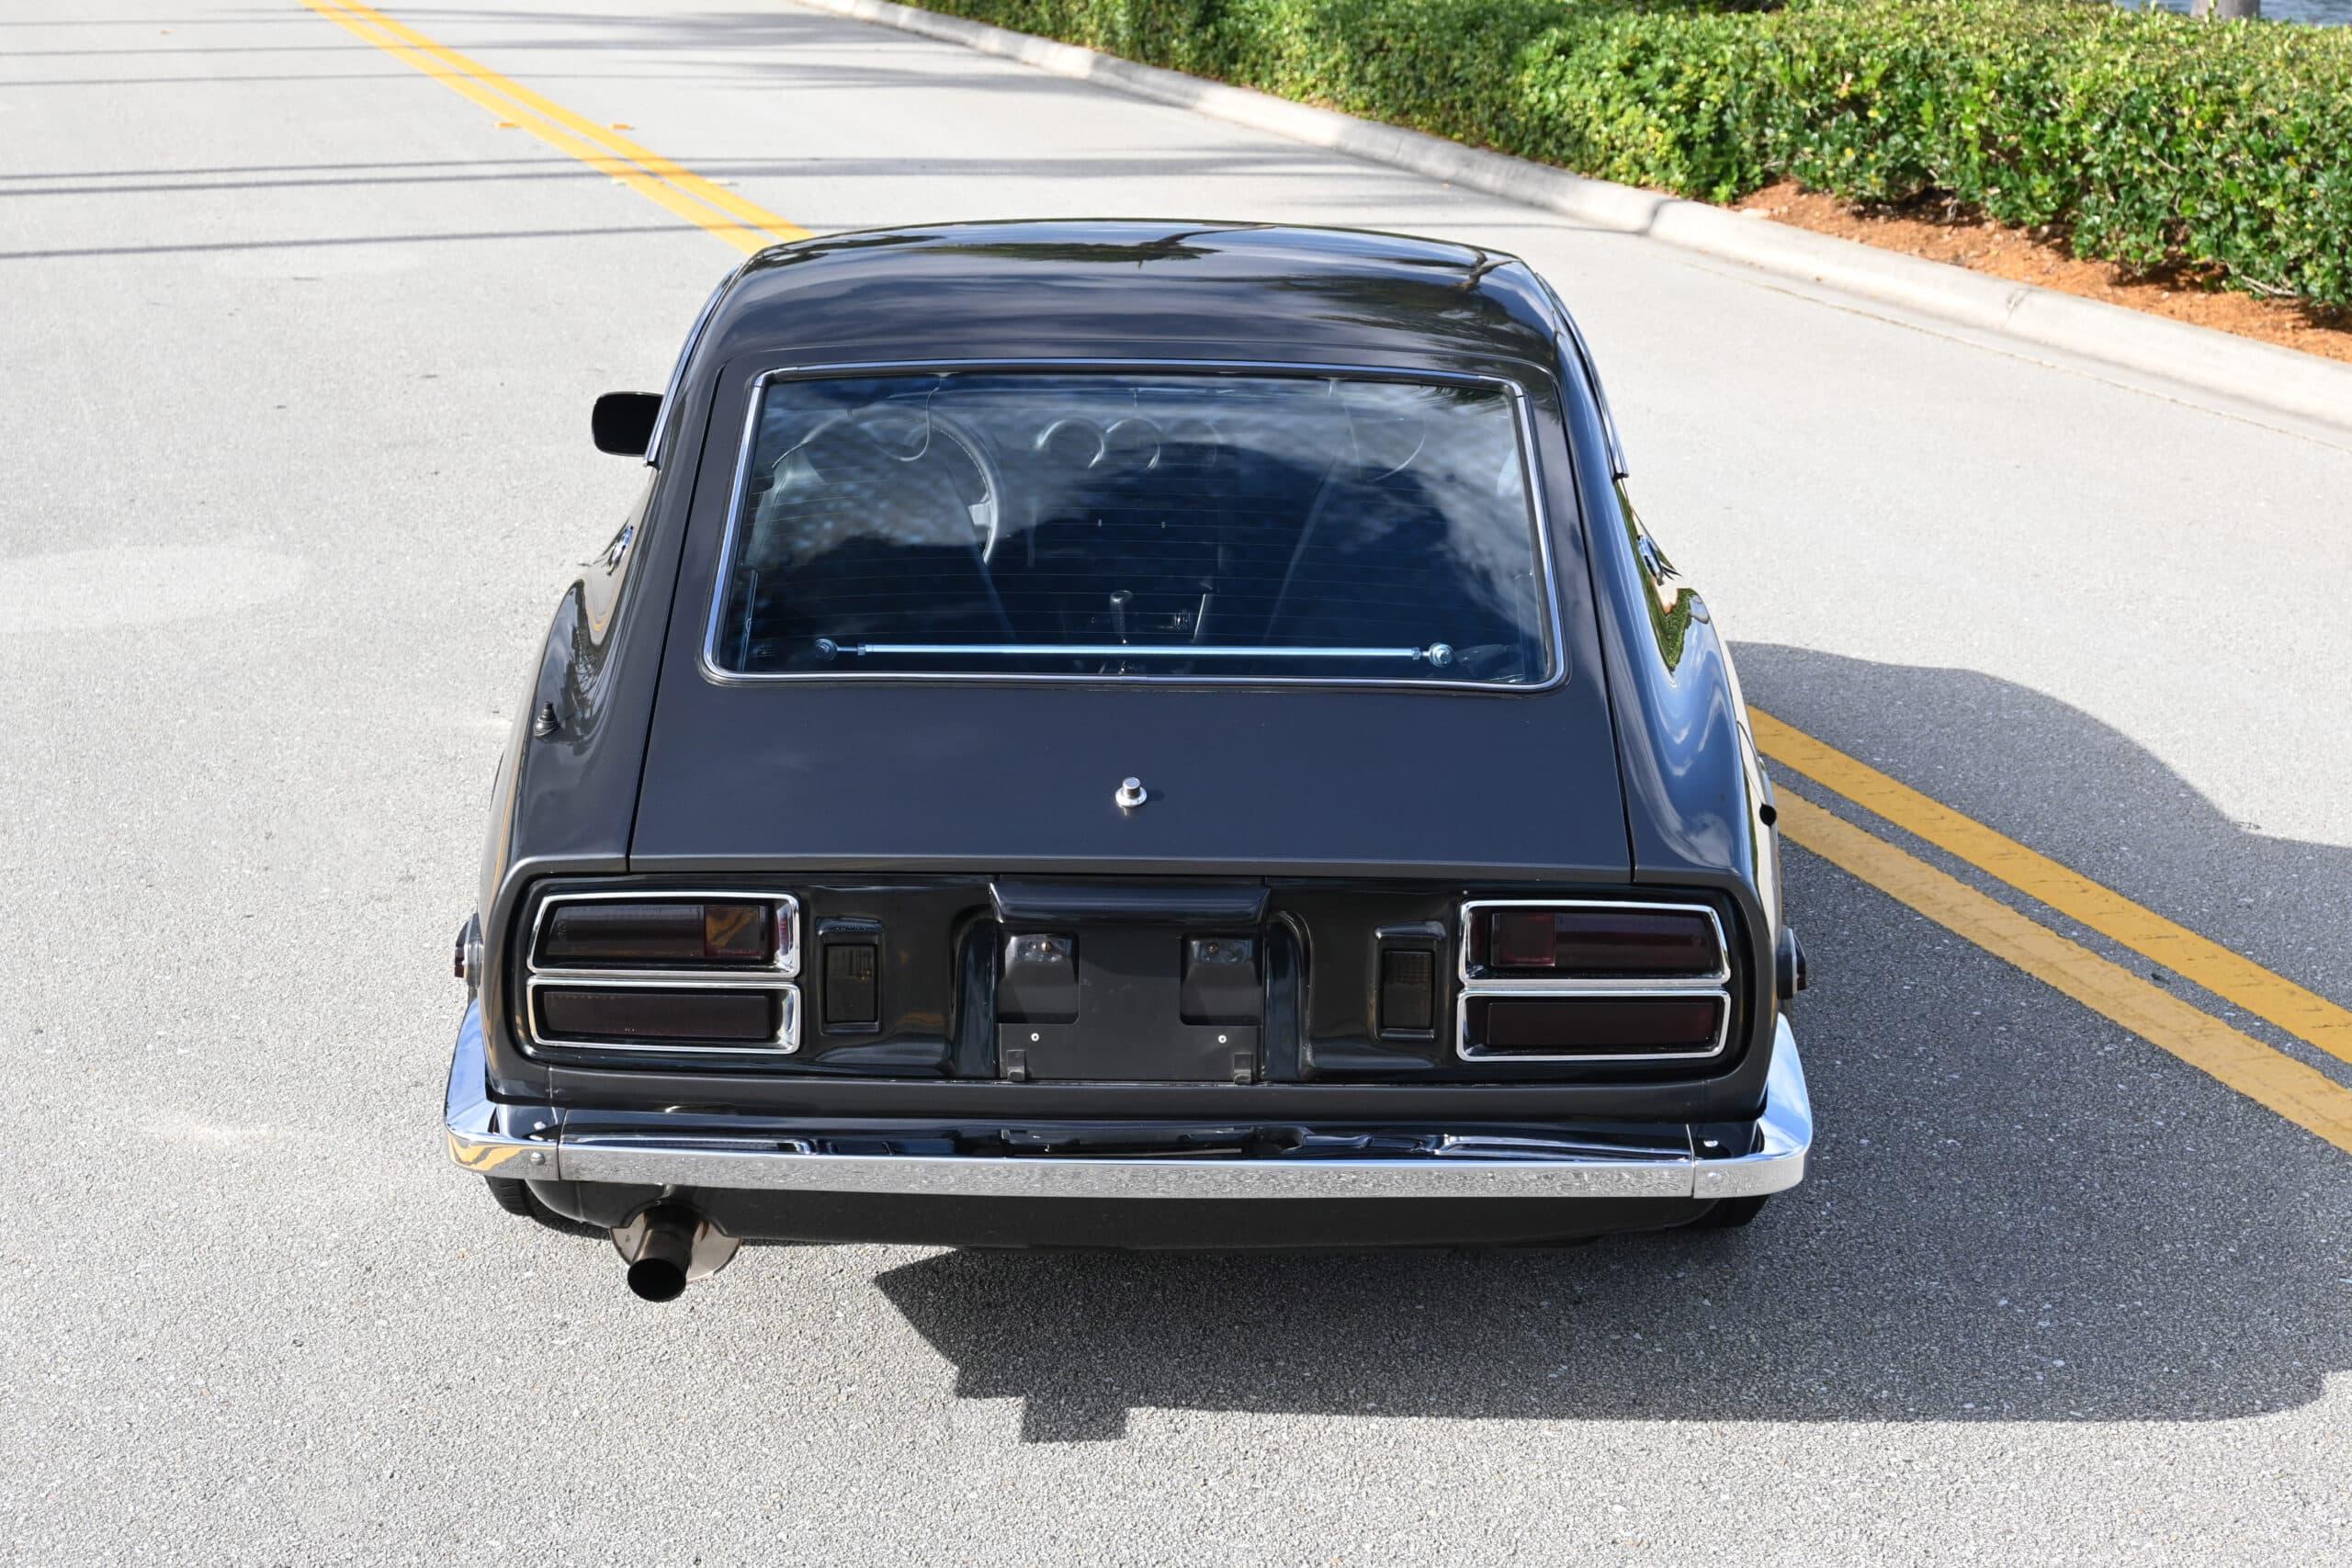 1974 Datsun 260Z Show Car look, California car, fresh paint, Weber 44s, Headers, lots of updates